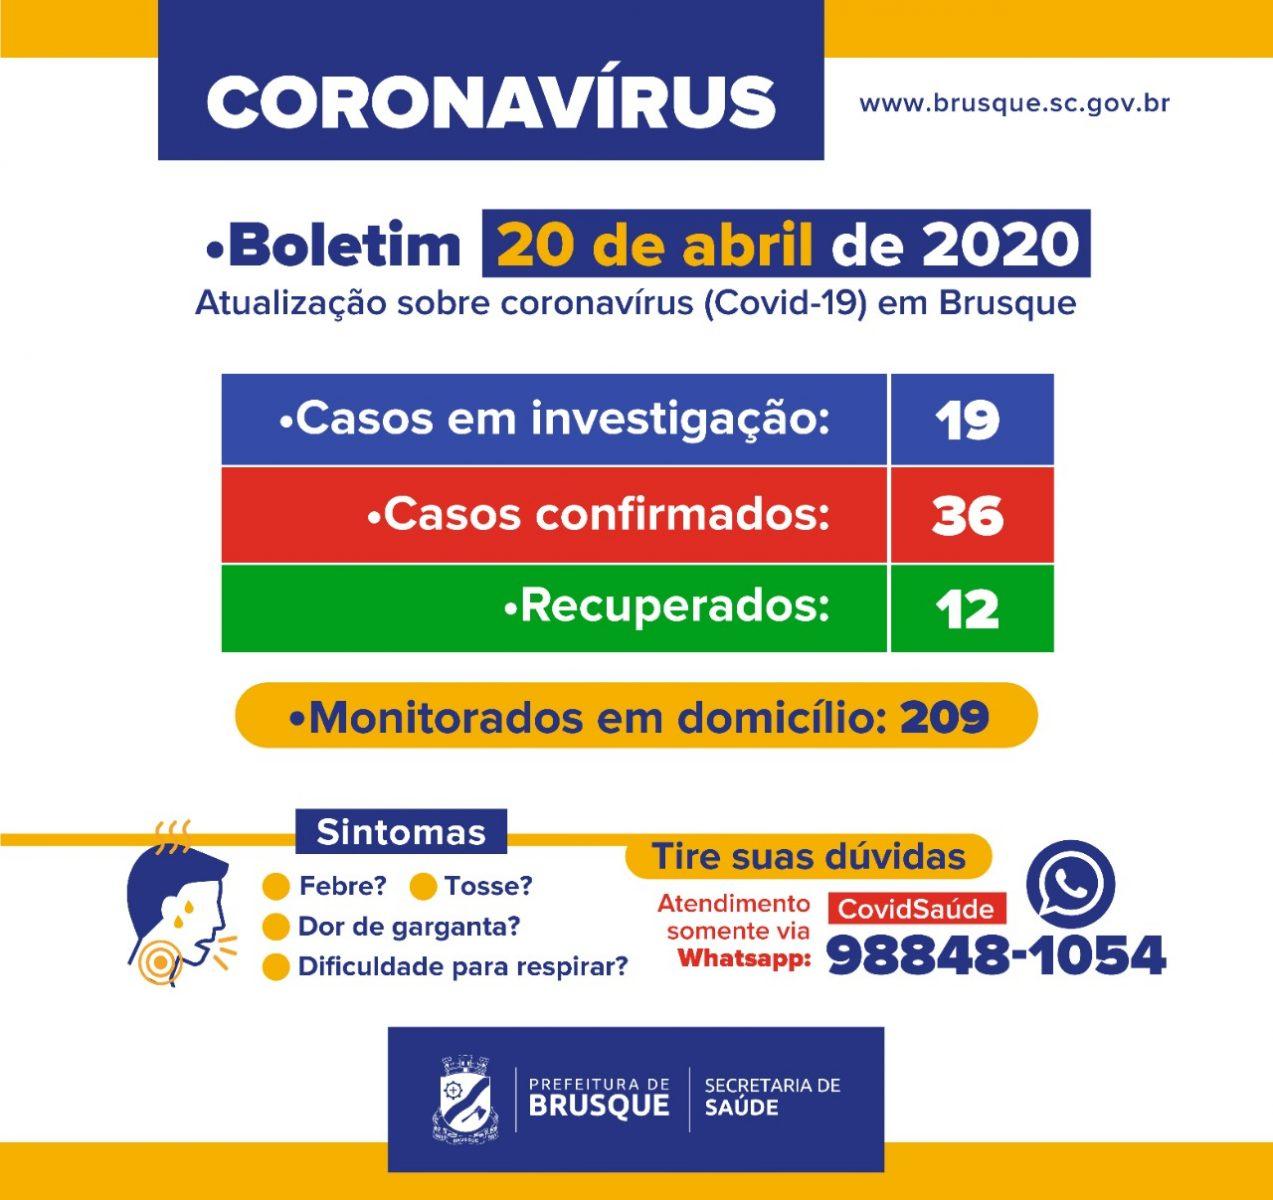 Confira o Boletim Epidemiológico da Prefeitura de Brusque desta segunda-feira (20)